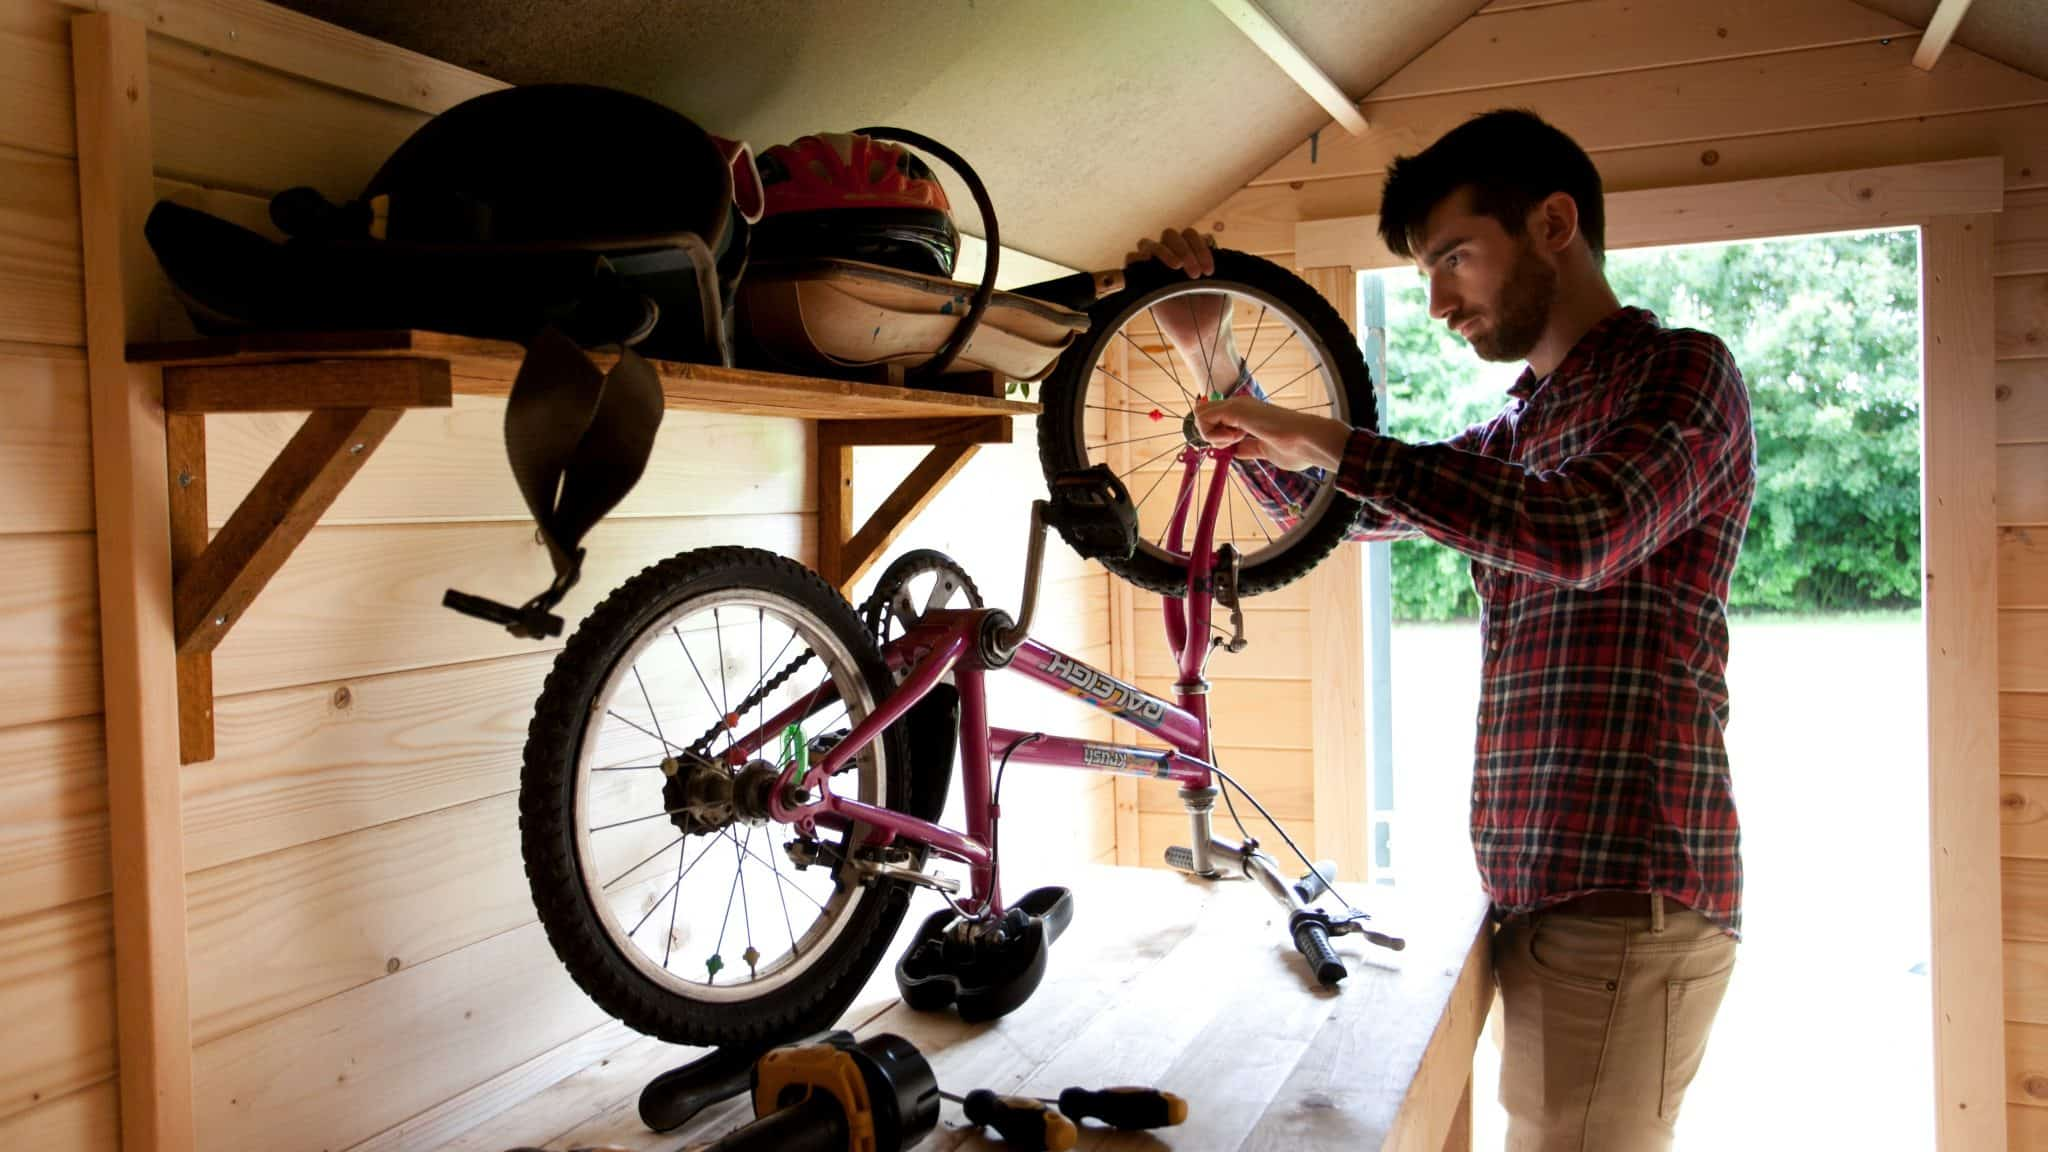 open shed with man inside putting upturned bike back on shelving